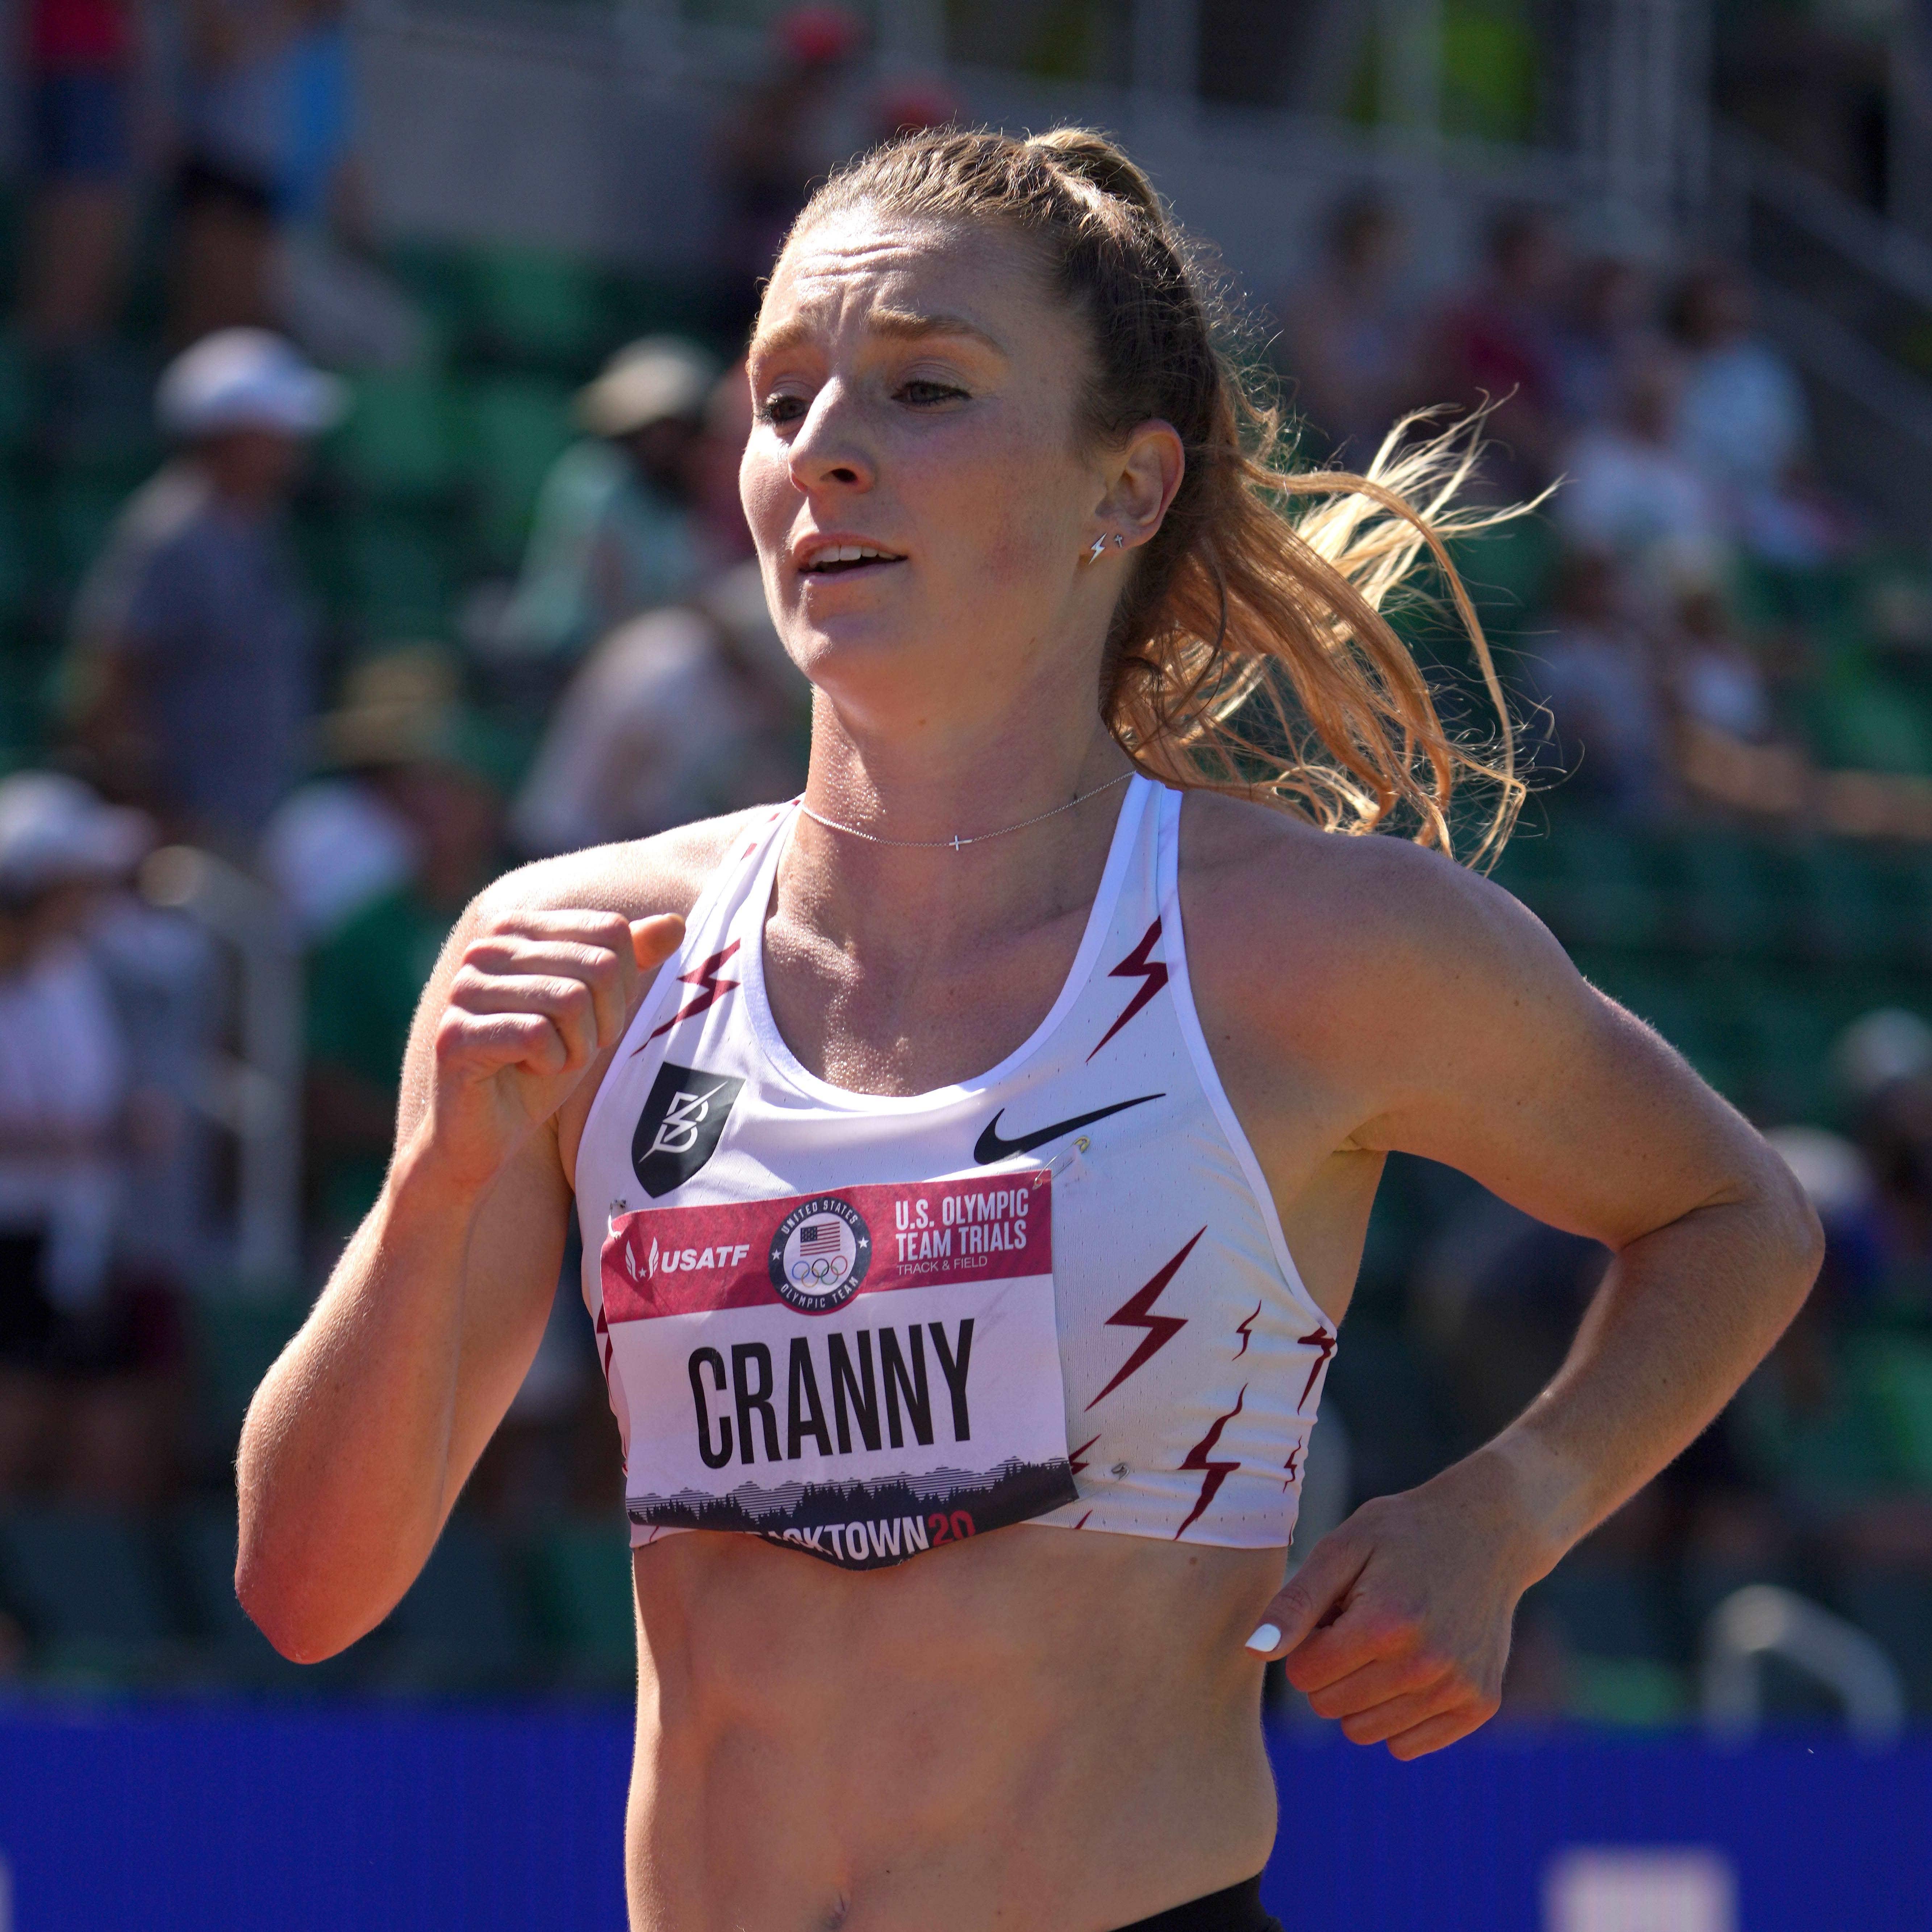 Elise Cranny